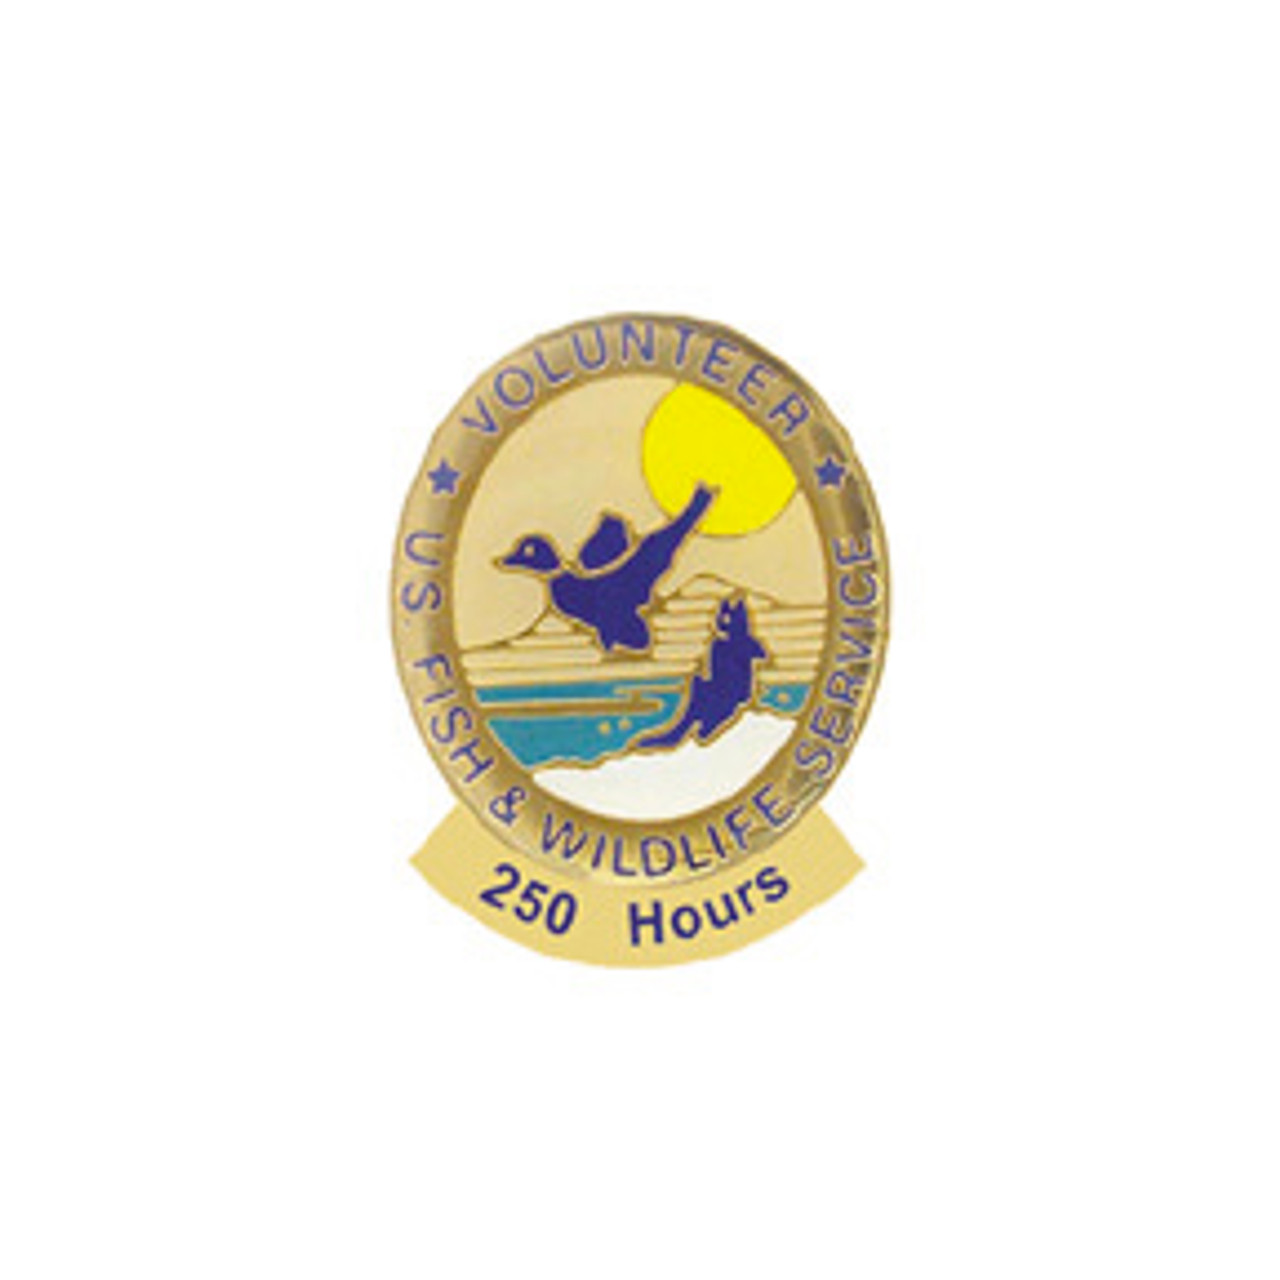 Fish & Wildlife Volunteer Hours Pin (1000 hours)